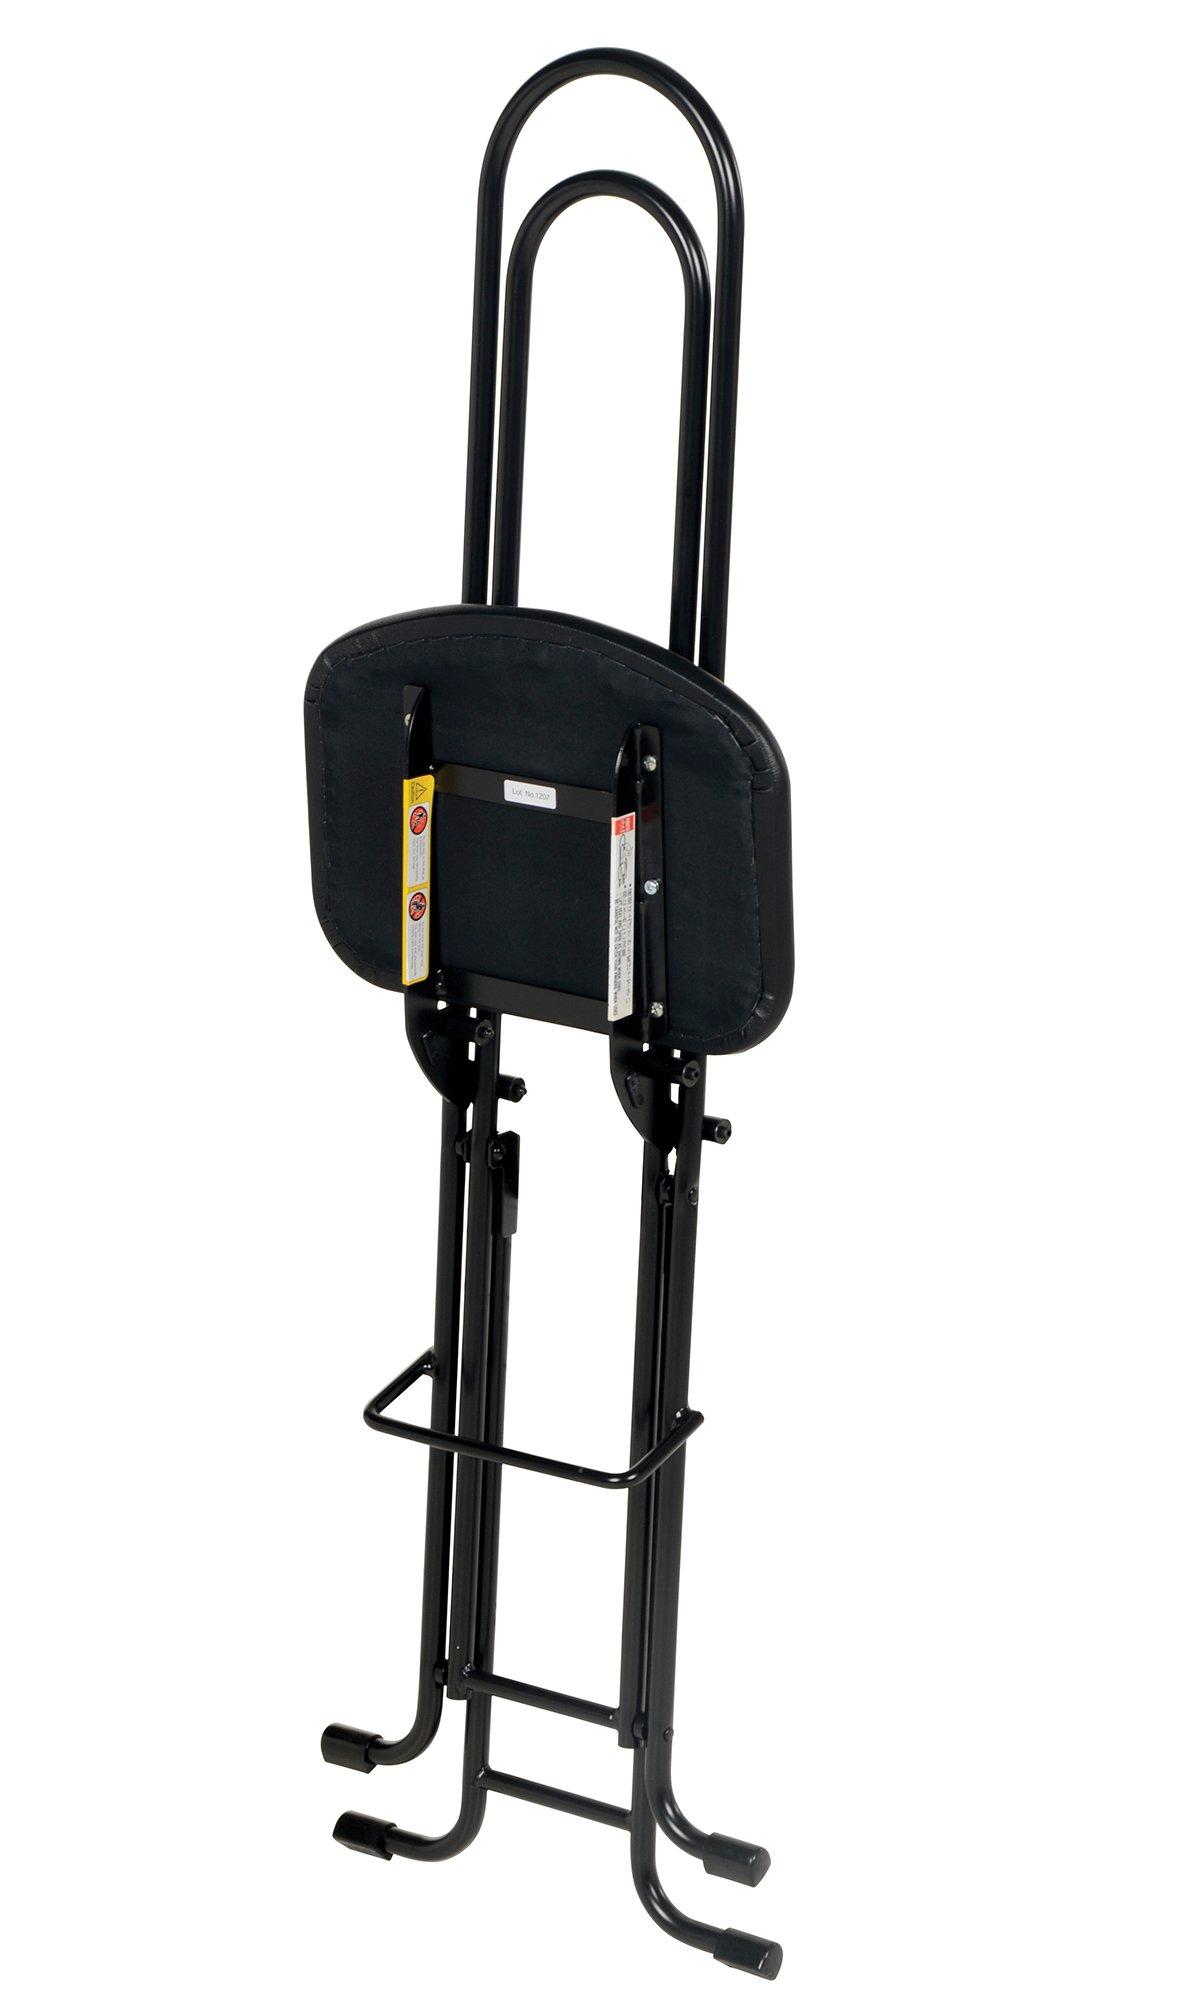 Vestil CPRO-800LP Ergonomic Worker Seat/Chair, 13-1/2'' Width, 10'' Depth, 300 lb. Capacity, 18'' - 33'' Height Range by Vestil (Image #5)